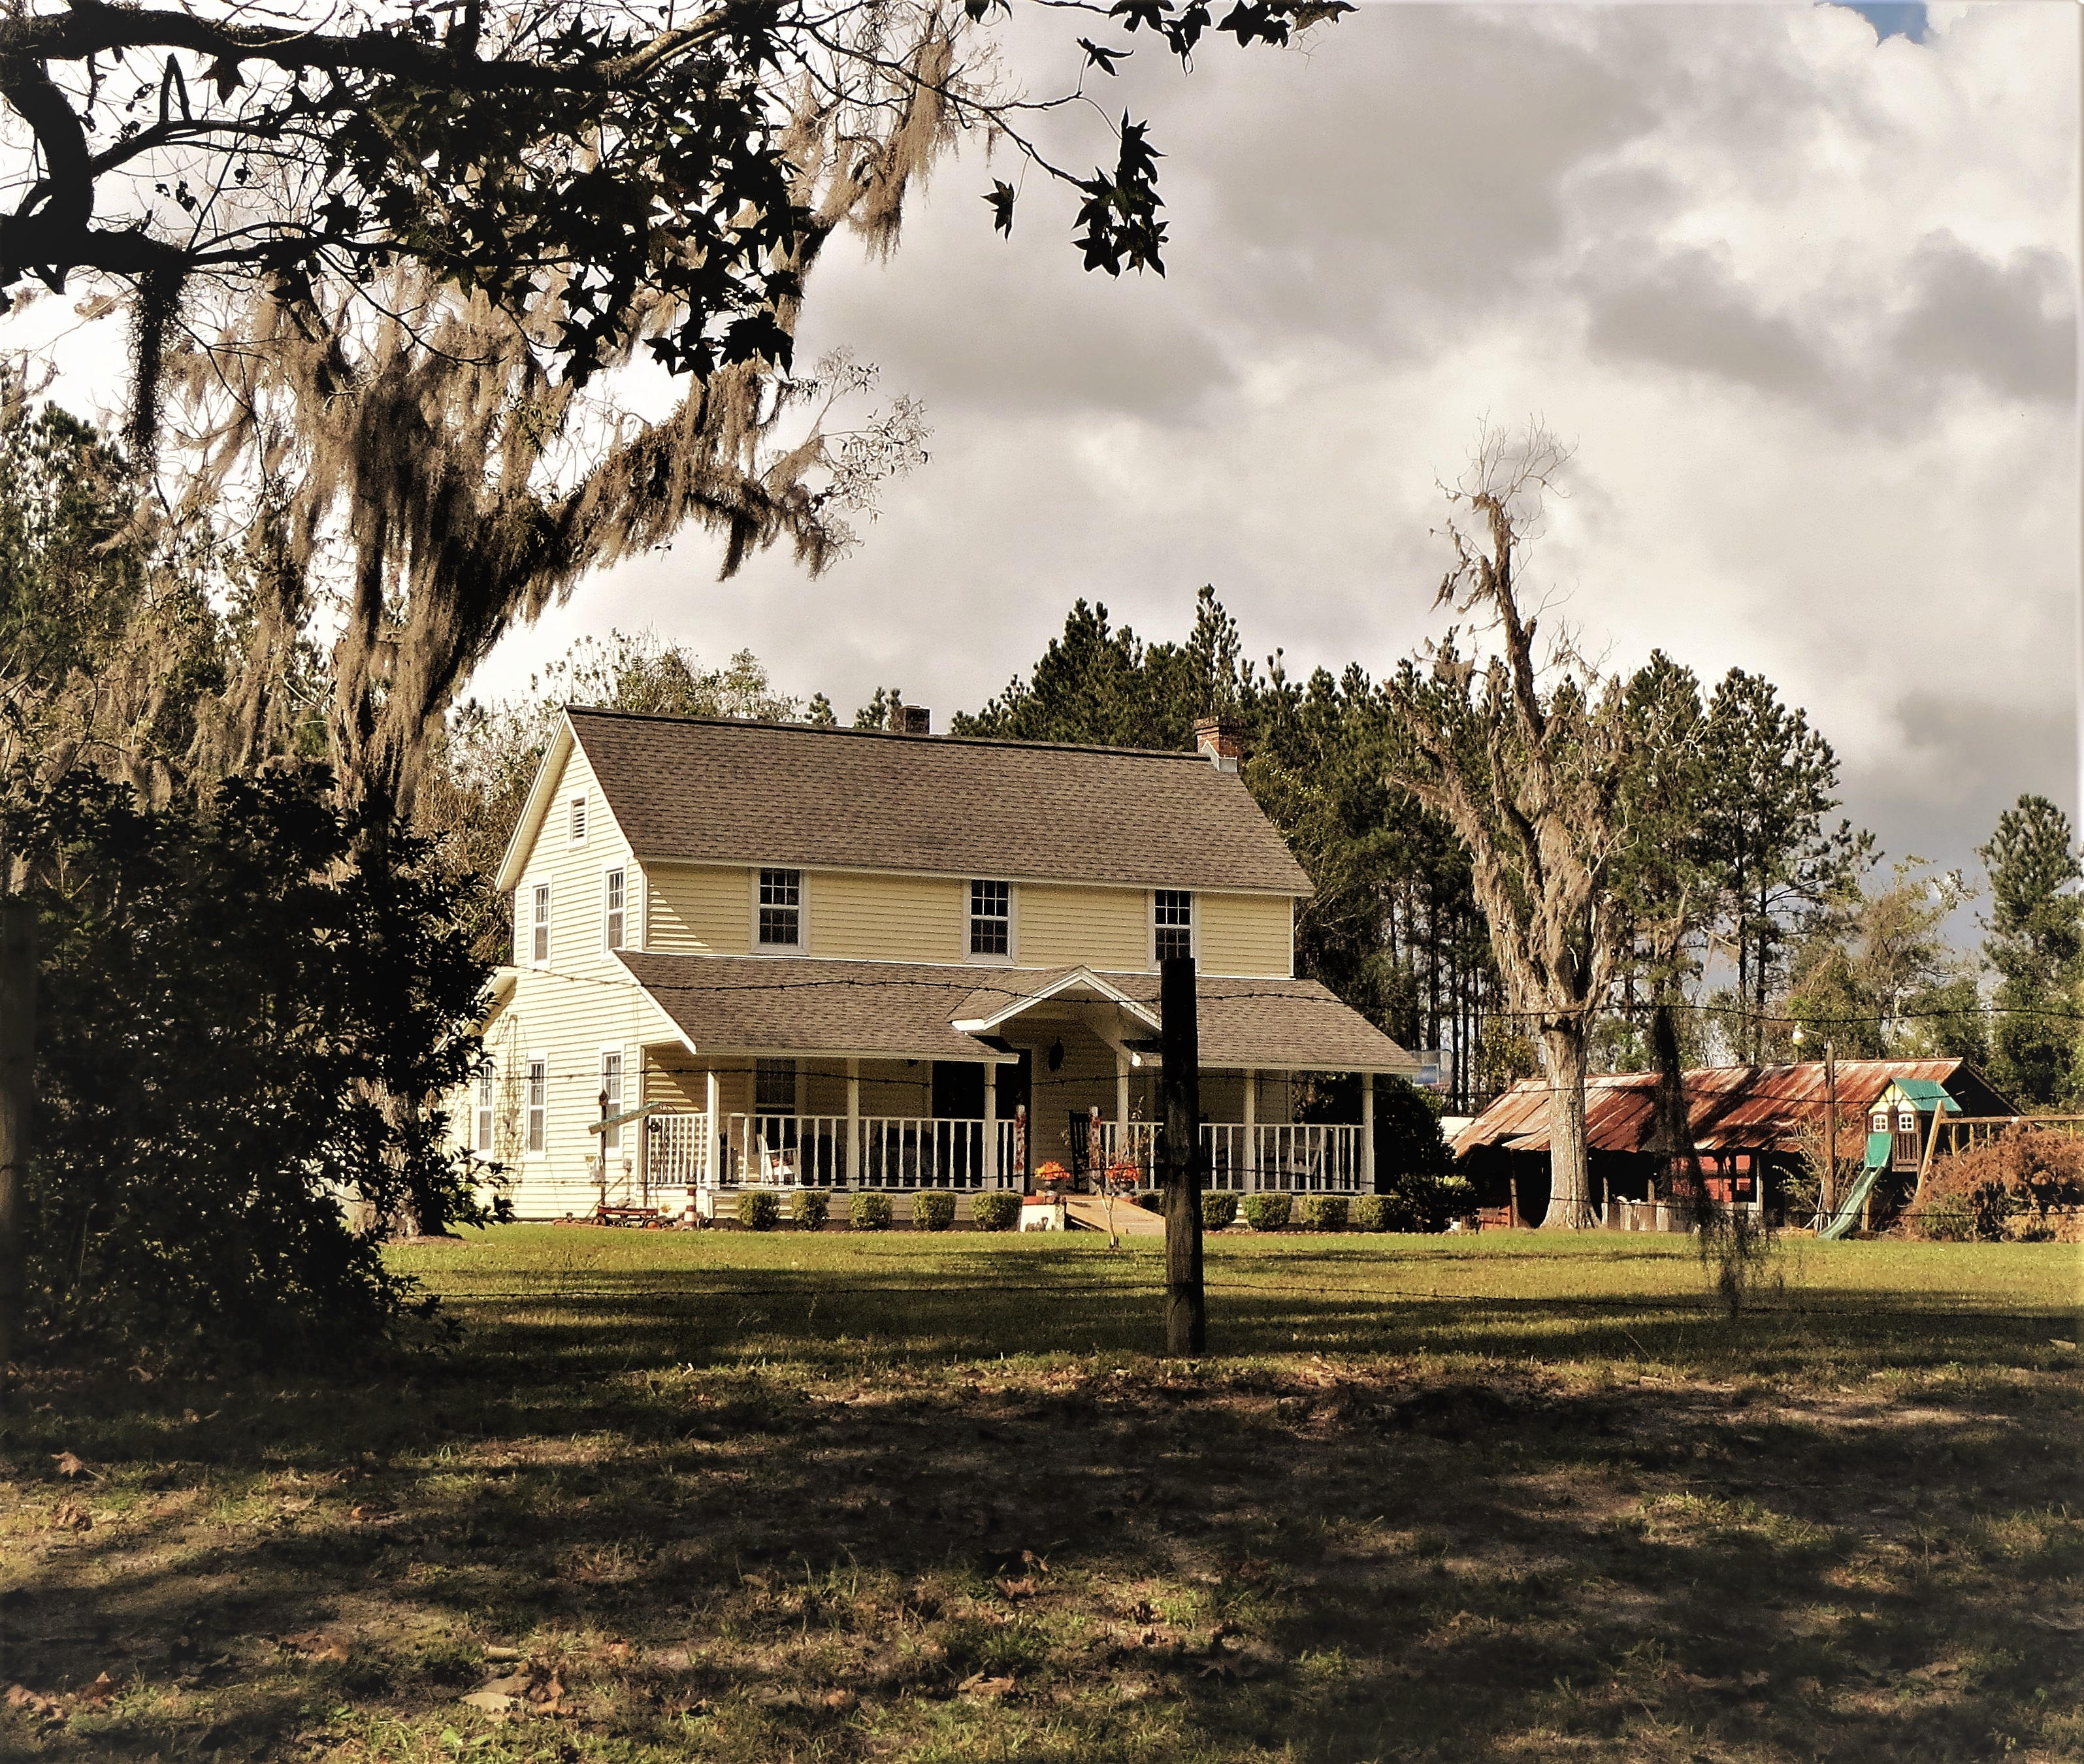 Rattlesnakes and the Murder House in Callahan | jaxpsychogeo